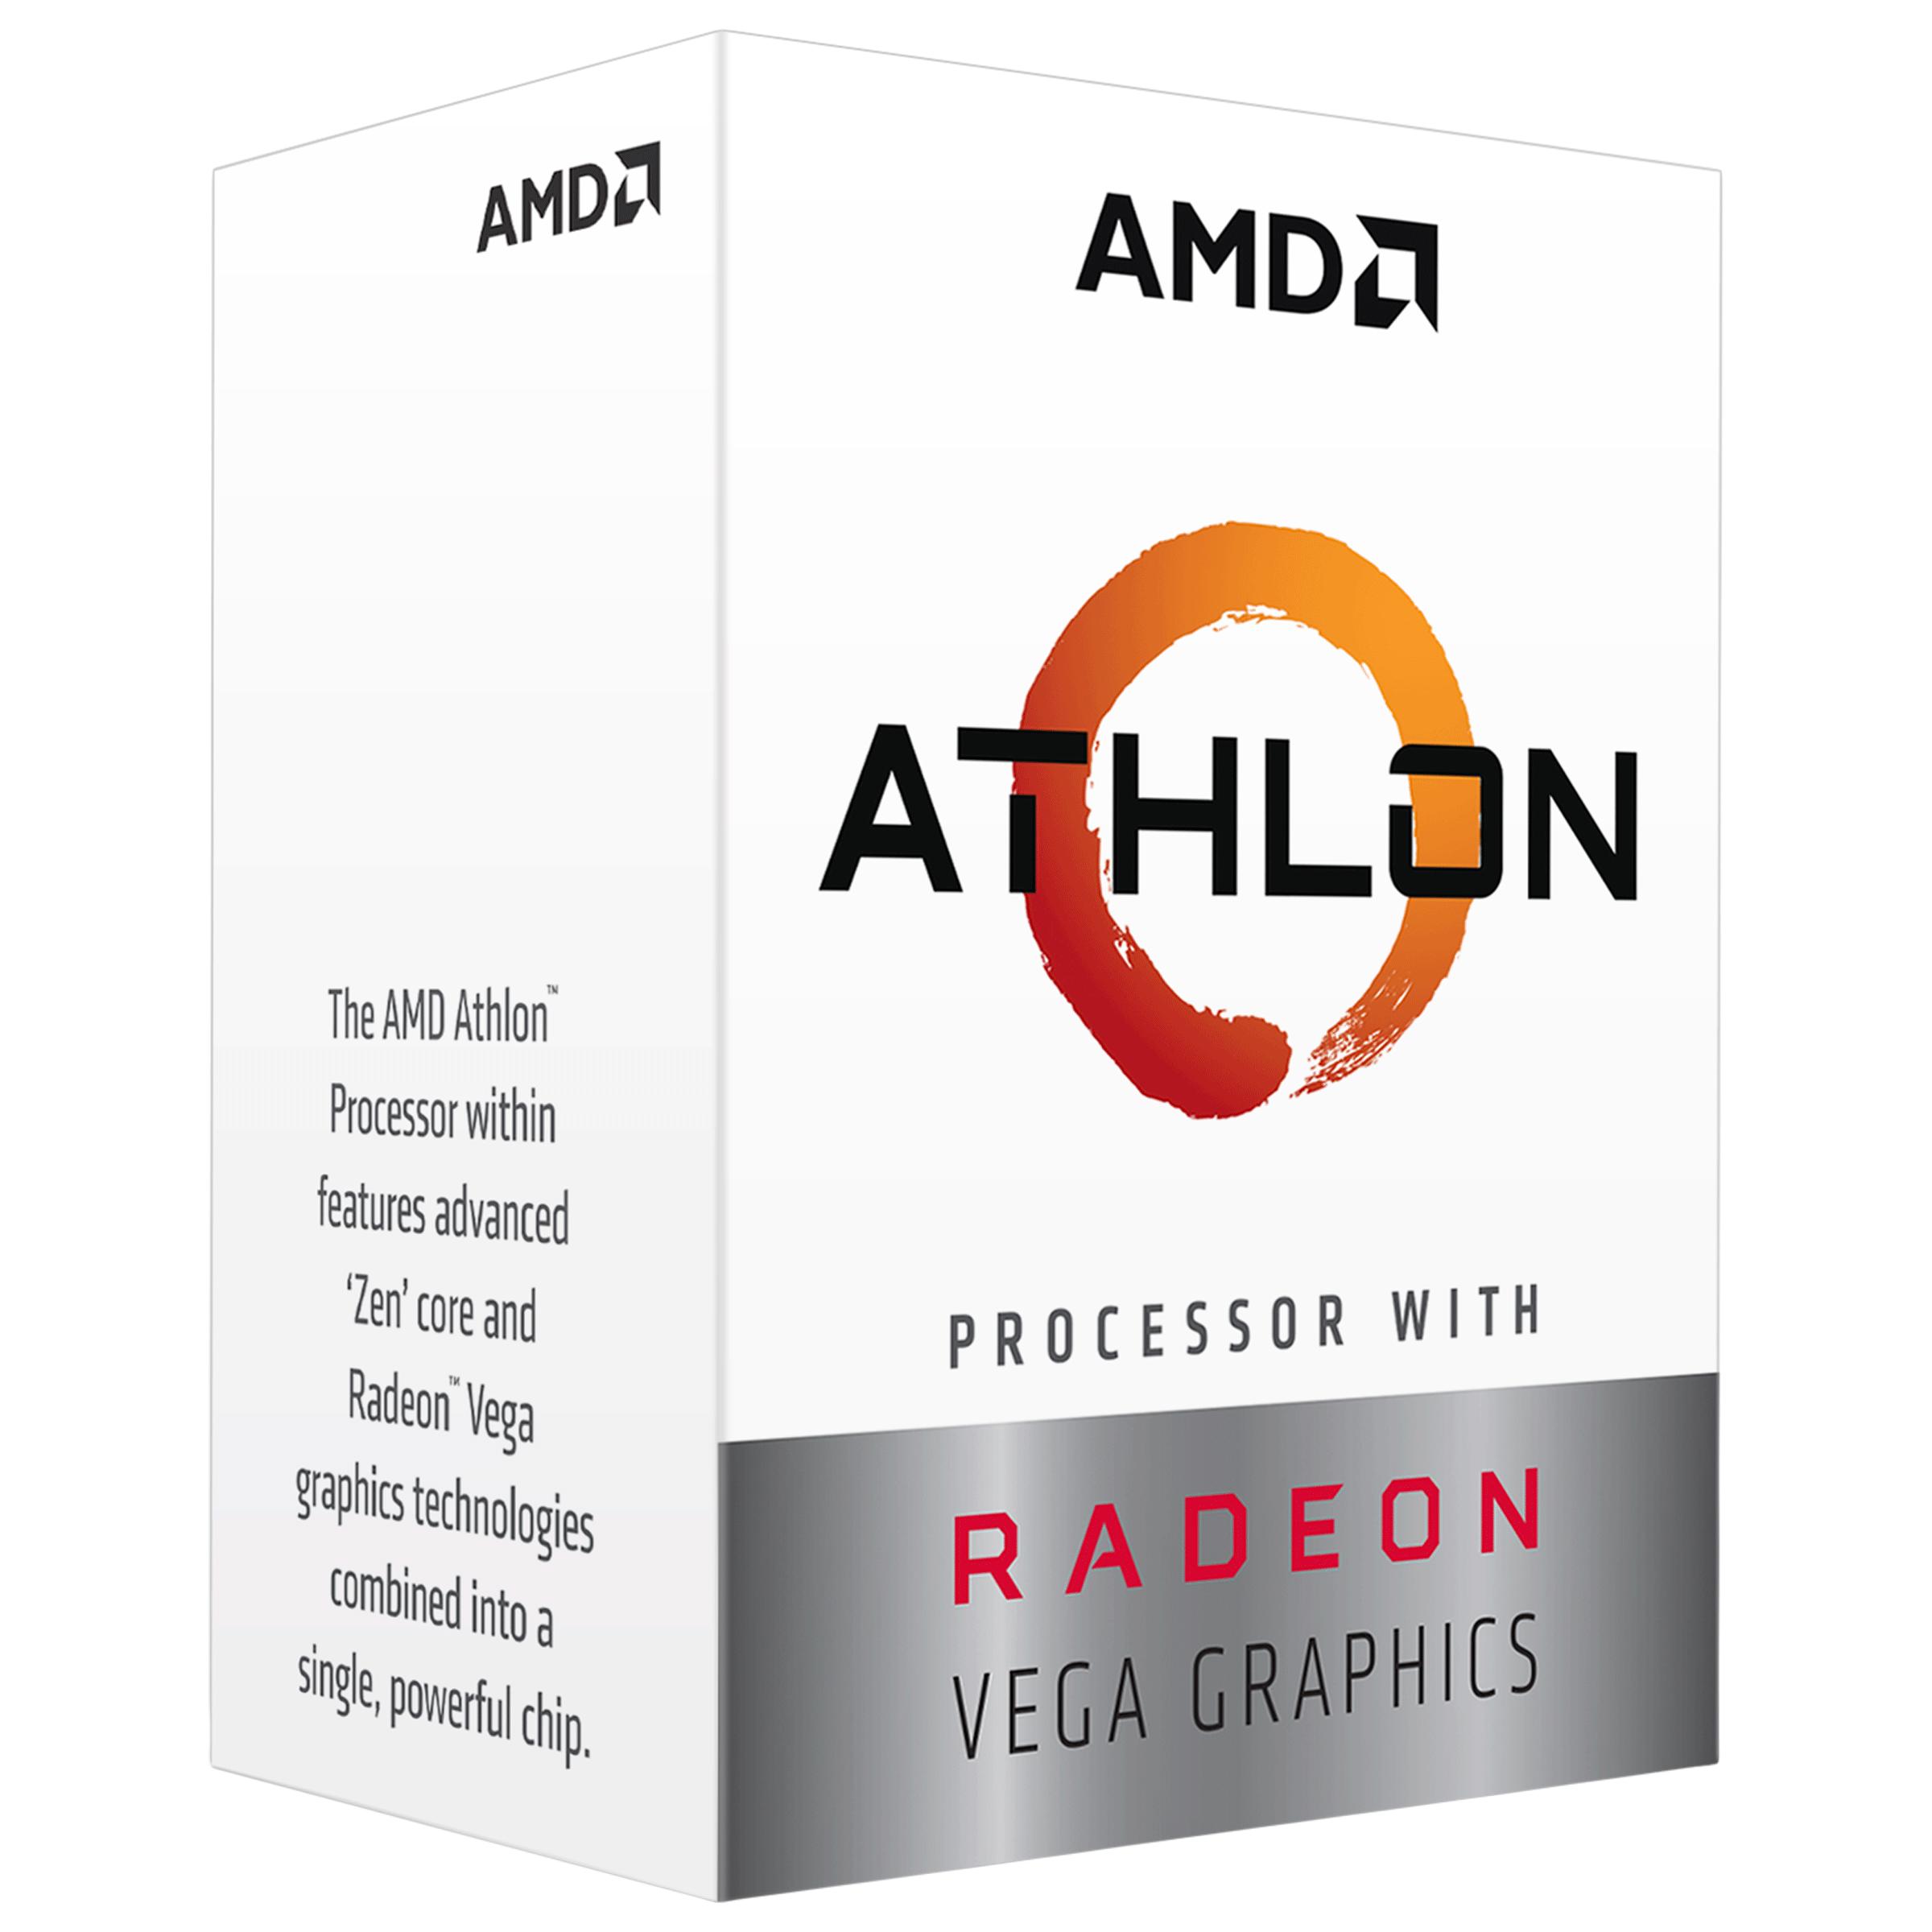 AMD Athlon Desktop Processor (2 Cores, 3.5 GHz, Unlocked For Overclocking, 3000G, Silver) _1